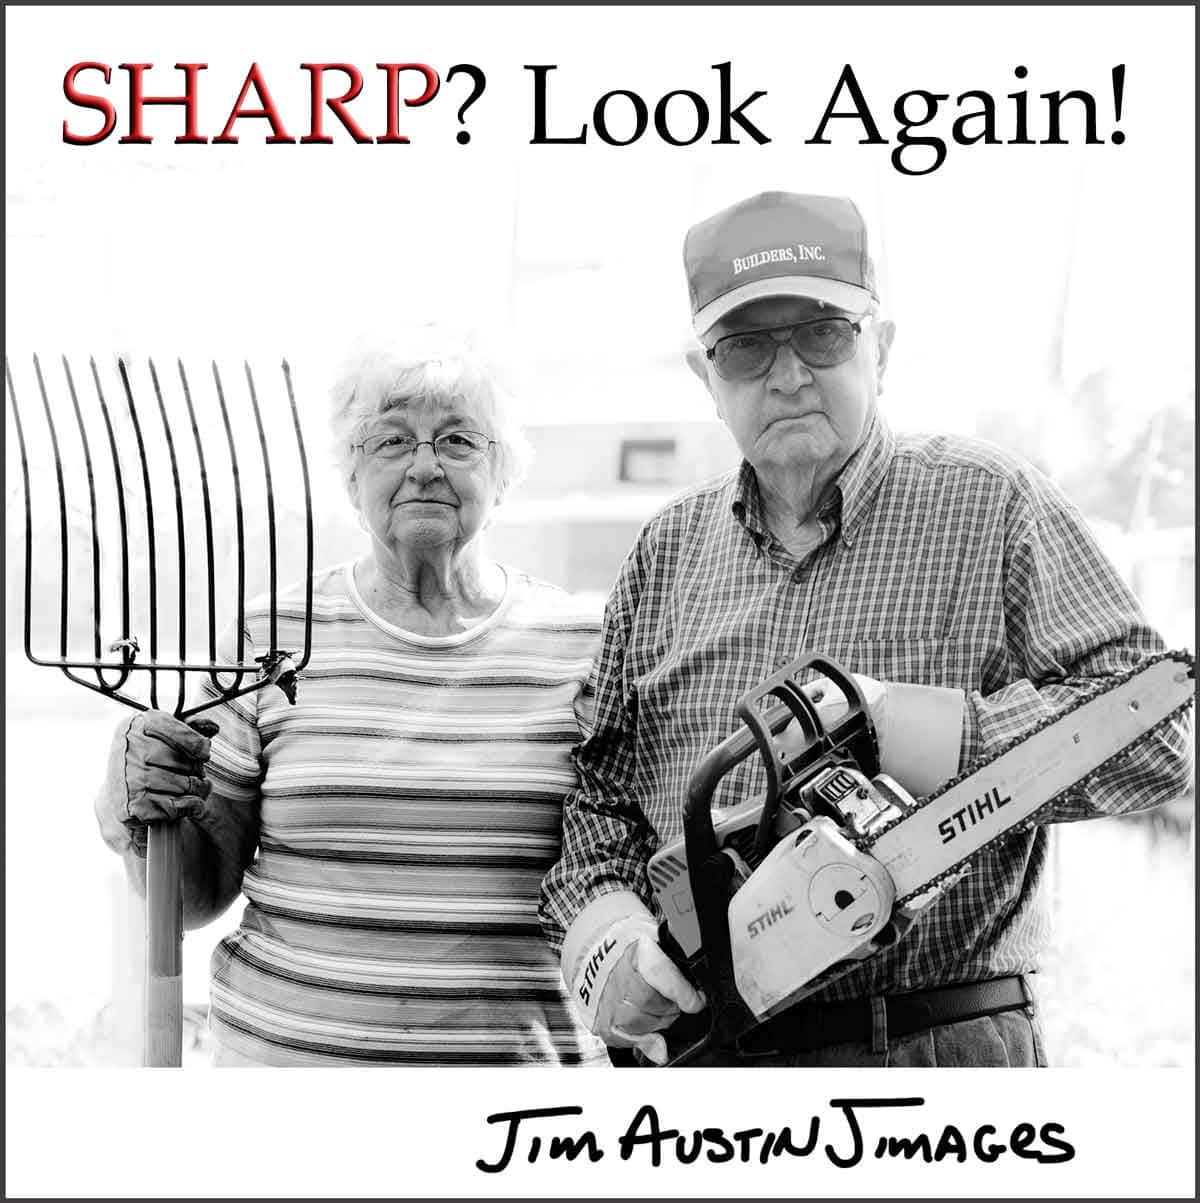 Sharp-Look-Again-Header-Jim-Austin-Jimagesdotcom-2018